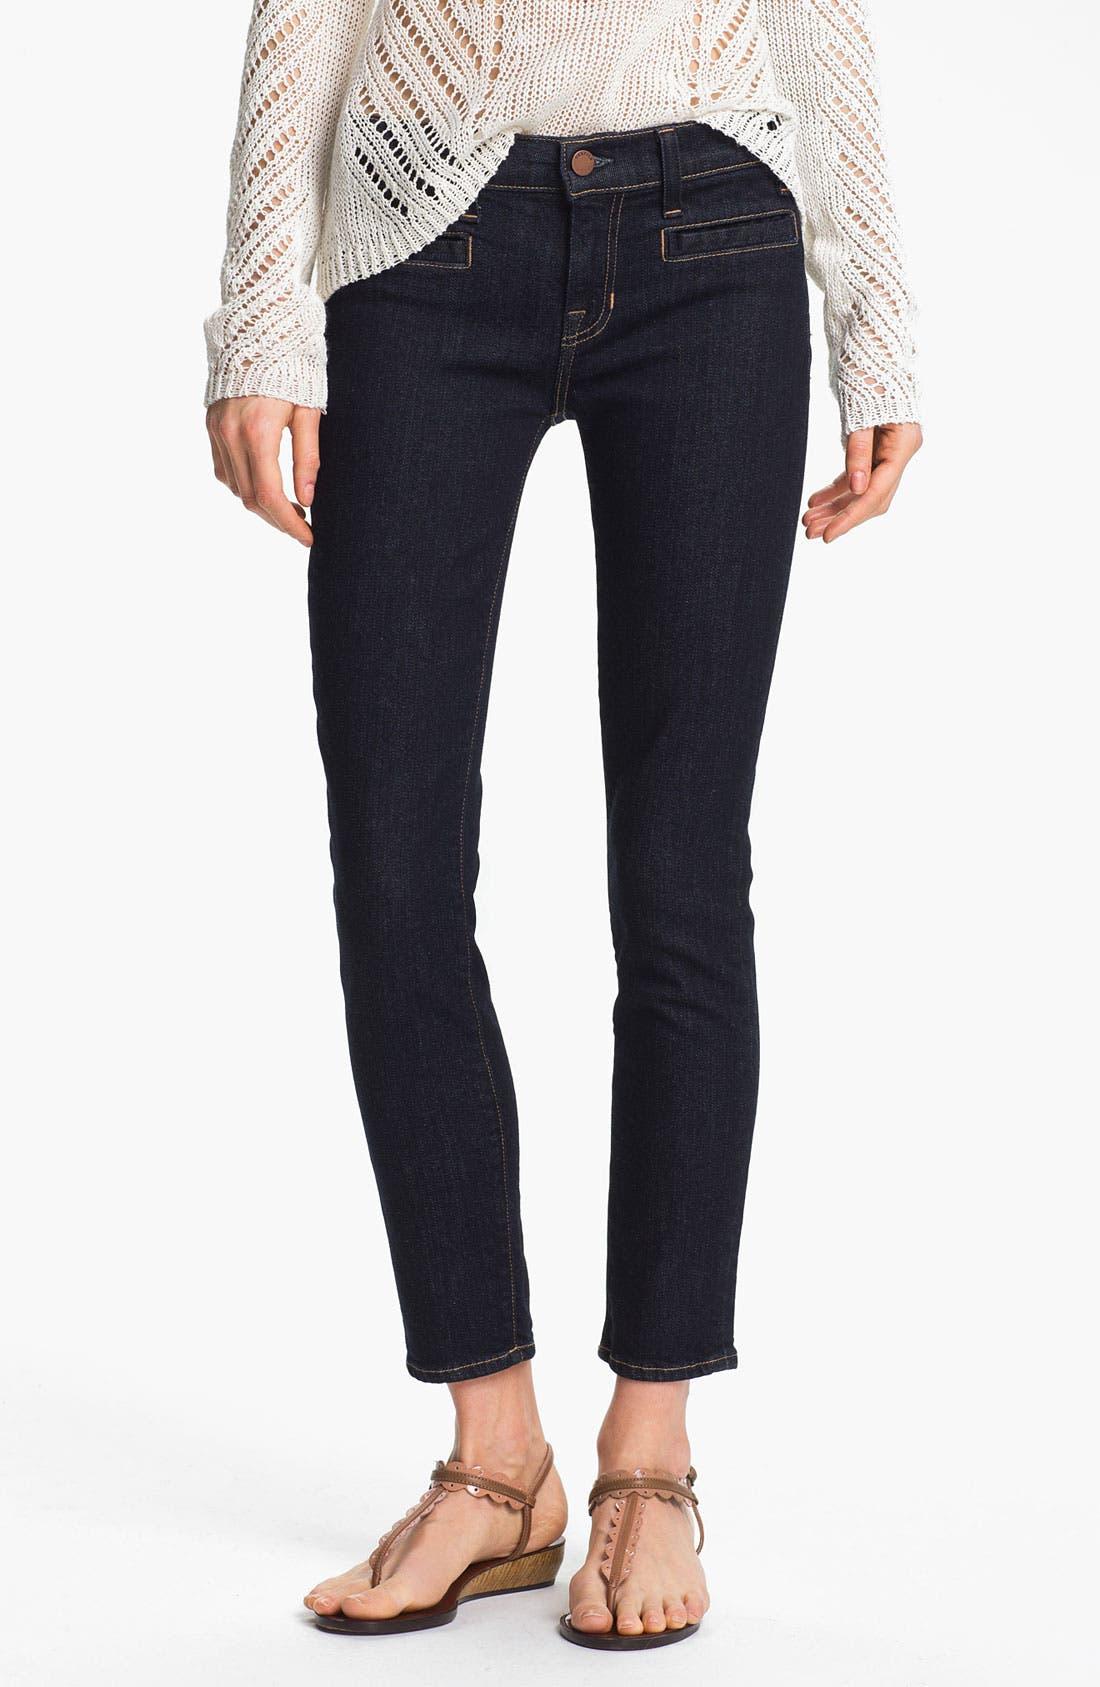 Alternate Image 1 Selected - TEXTILE Elizabeth and James 'Tucker' Skinny Jeans